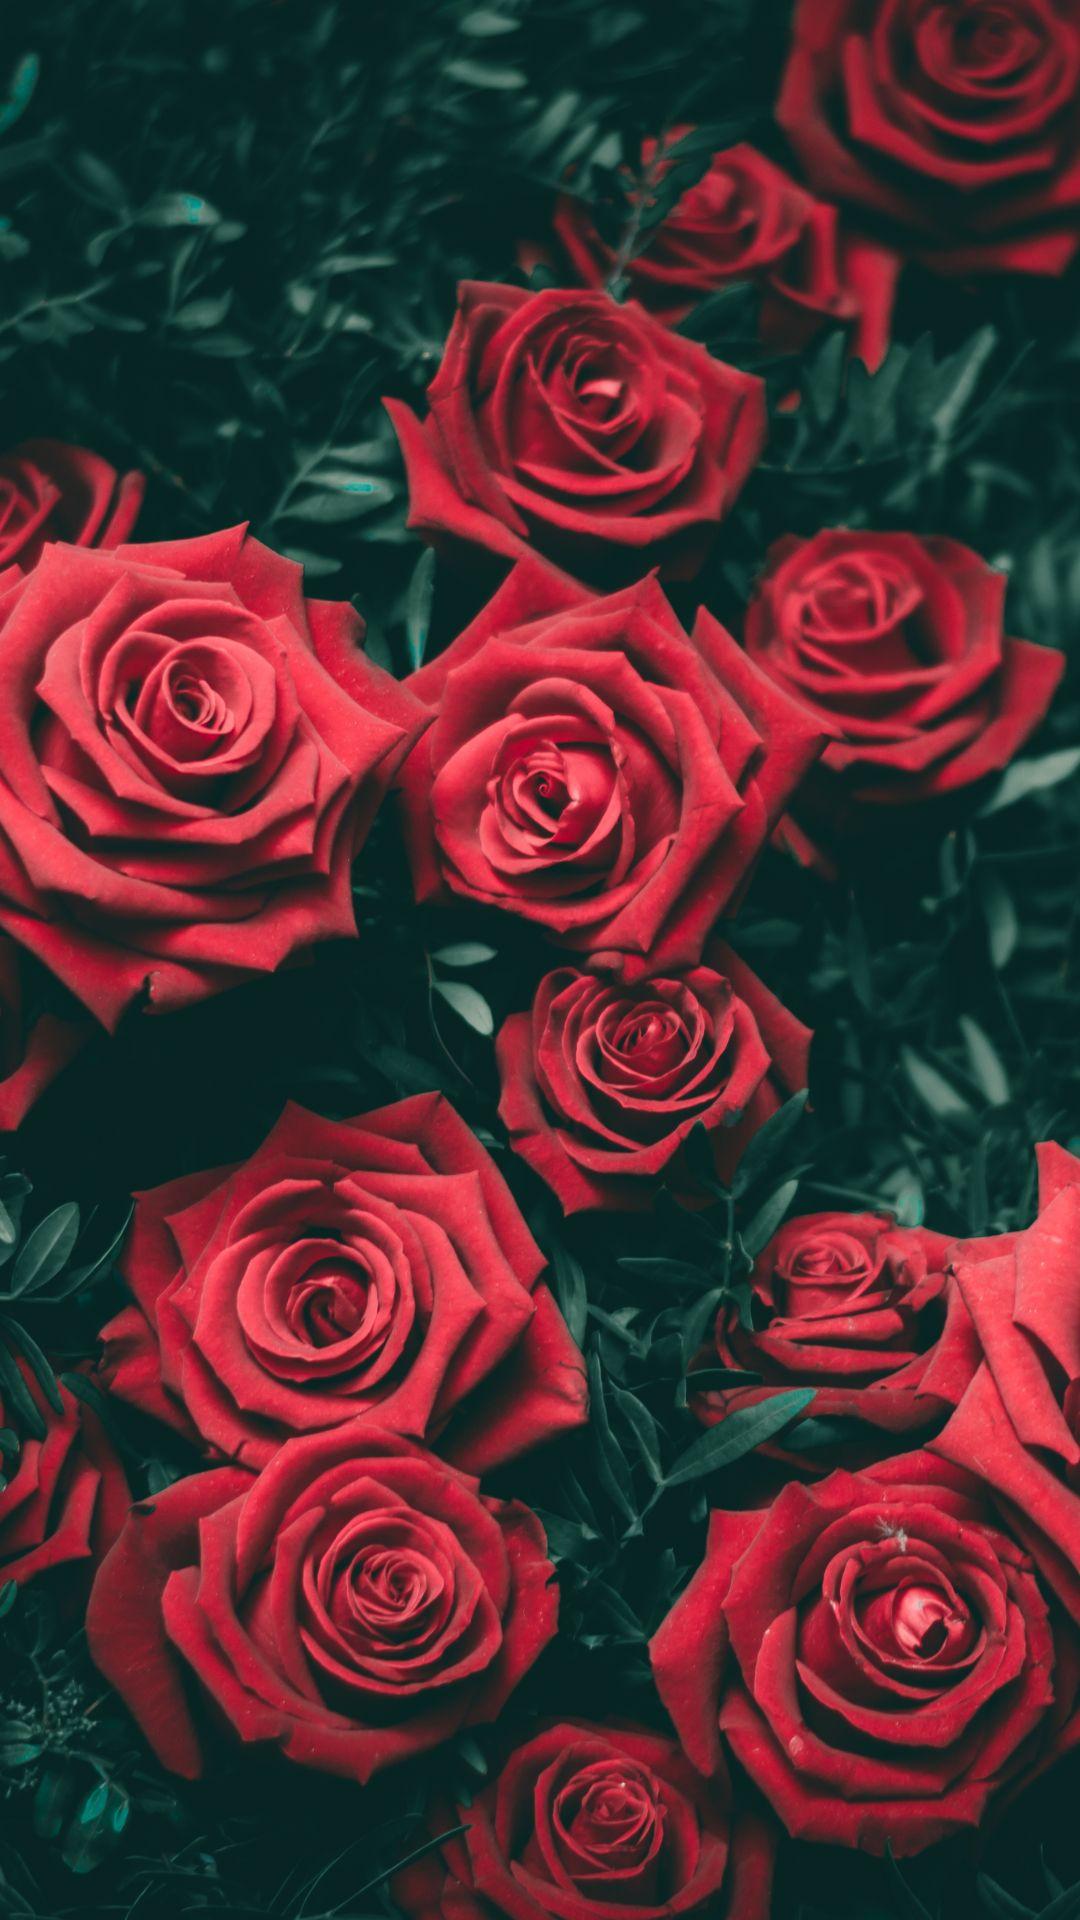 Hd Wallpaper 54 Red Roses Flowers Rose